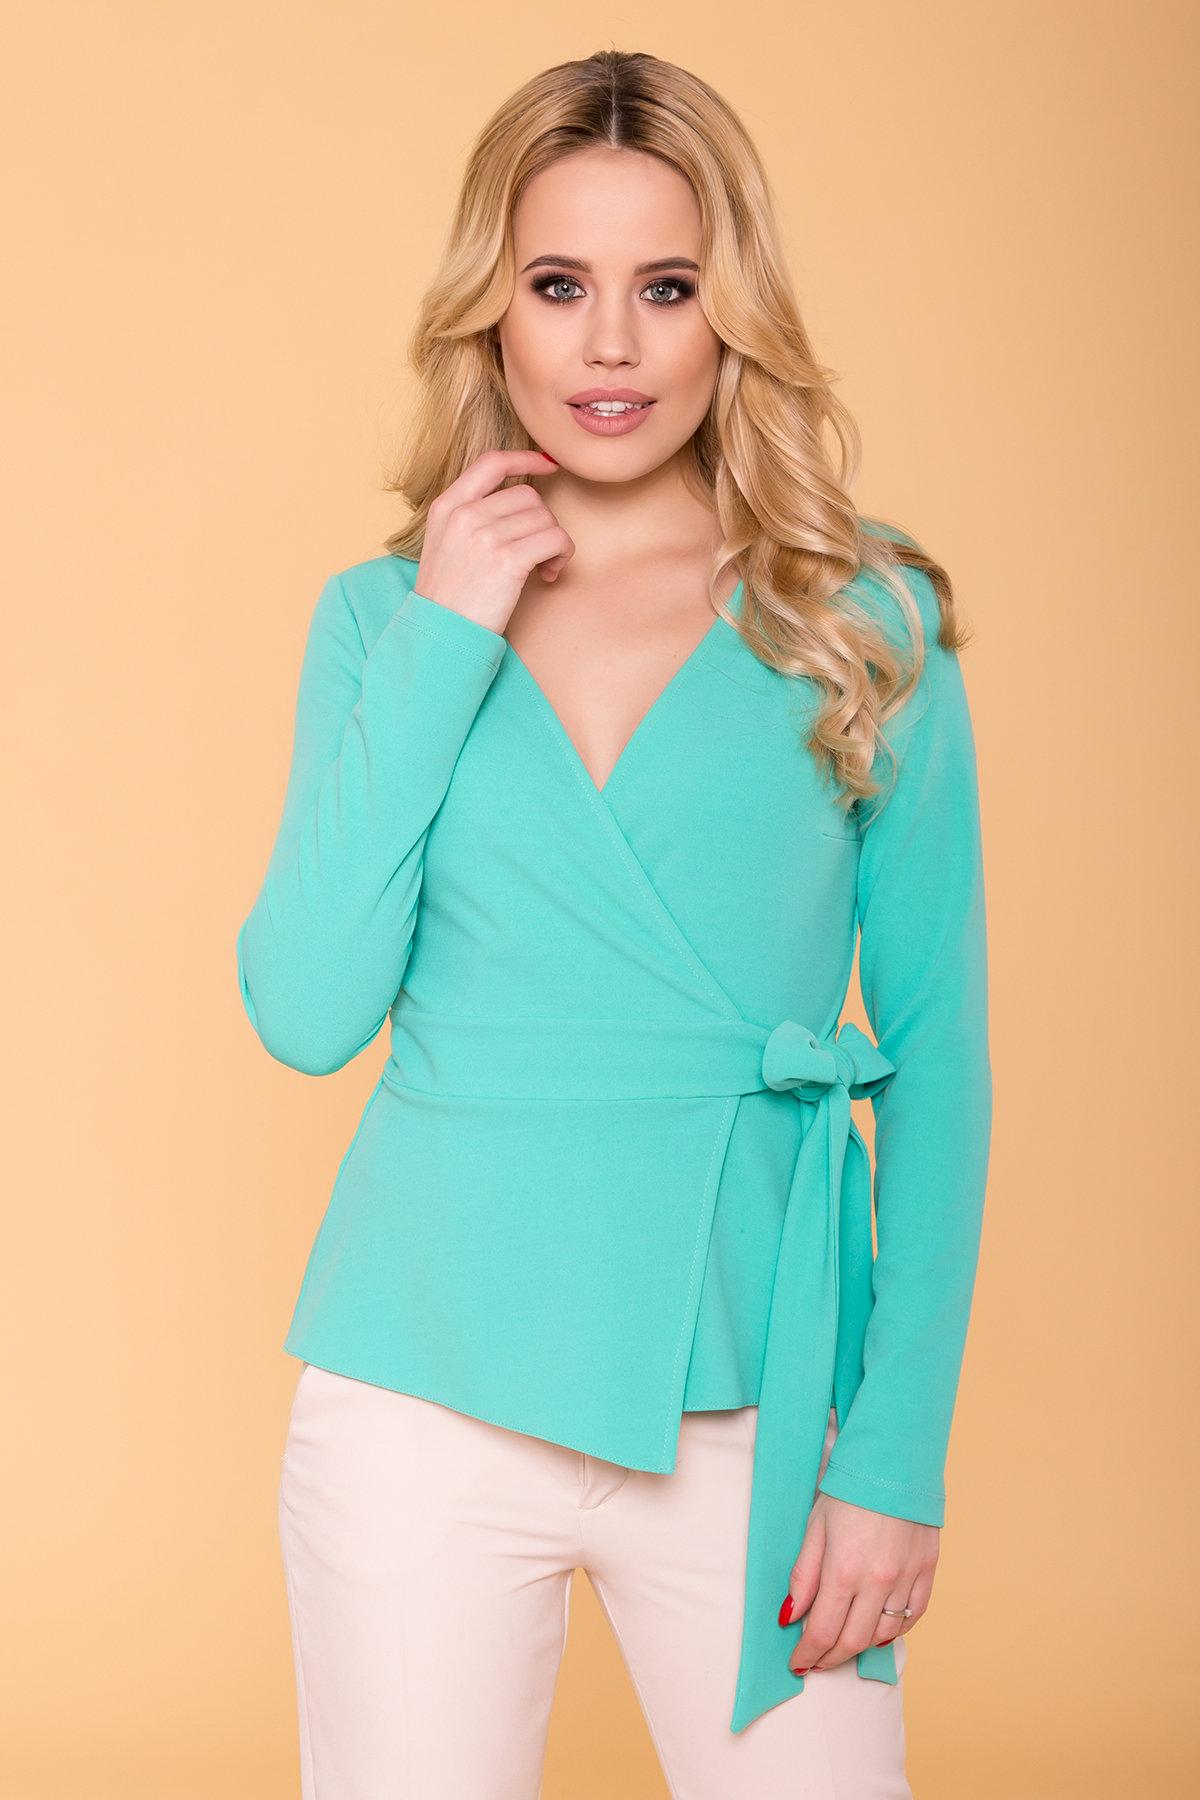 Блуза  Марсо 6432 АРТ. 41430 Цвет: Бирюзa - фото 3, интернет магазин tm-modus.ru